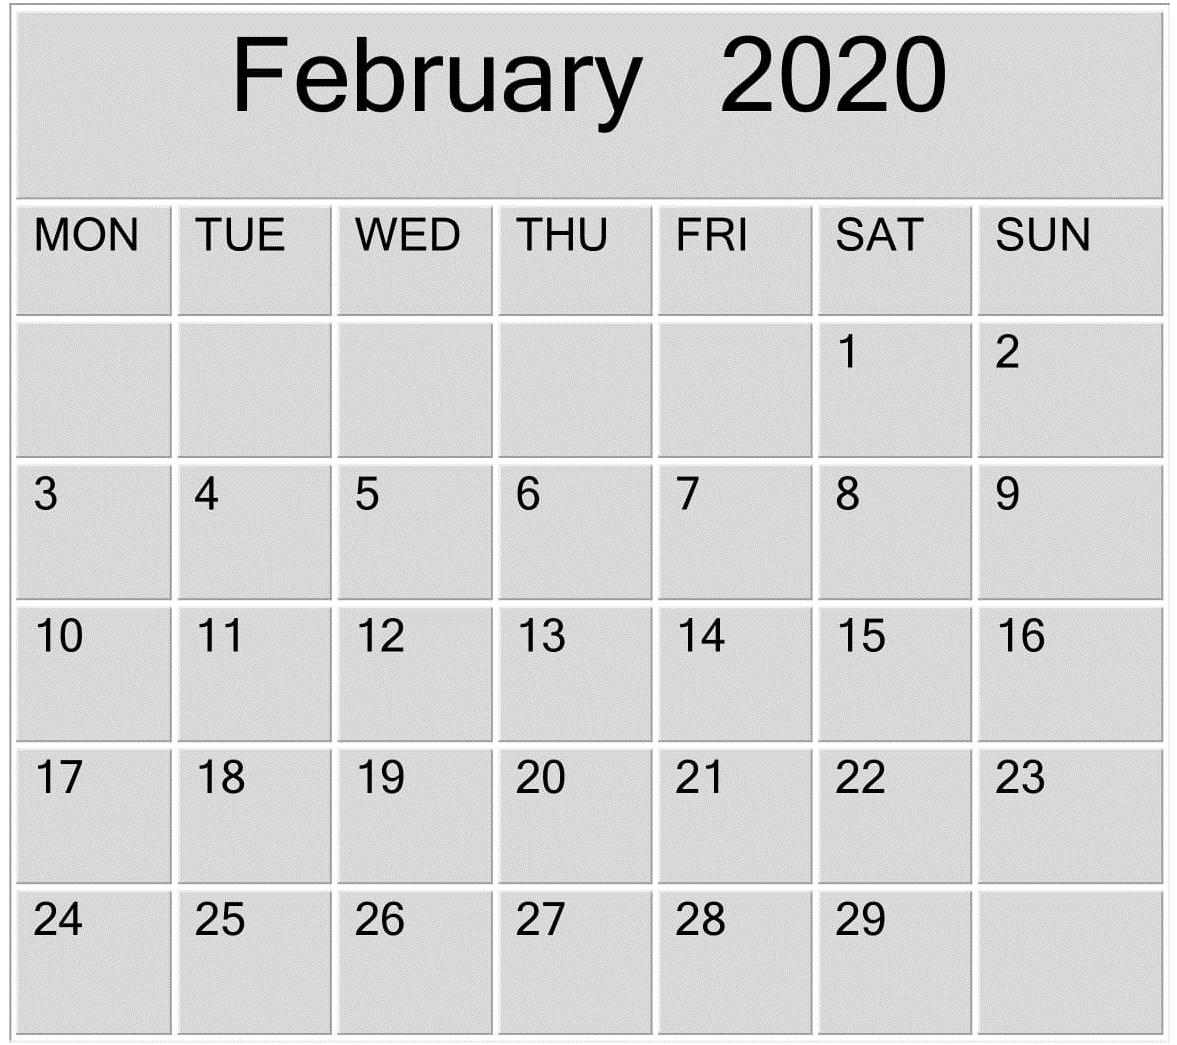 February 2020 Blank Calendar Word, Excel Template – Free inside 2020 Etited Calendar